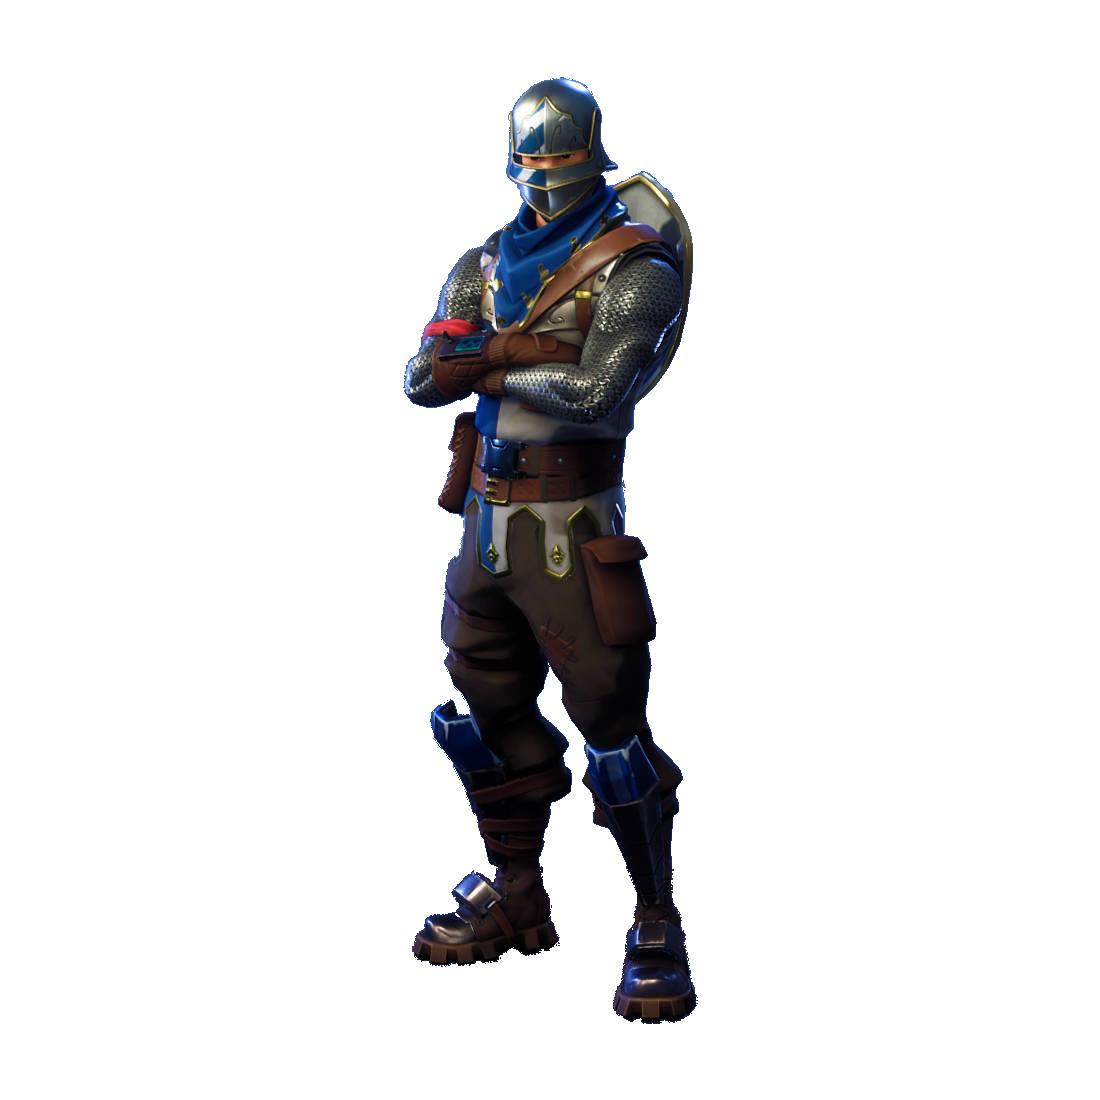 Fortnite Blue Squire Character Skin Sticker